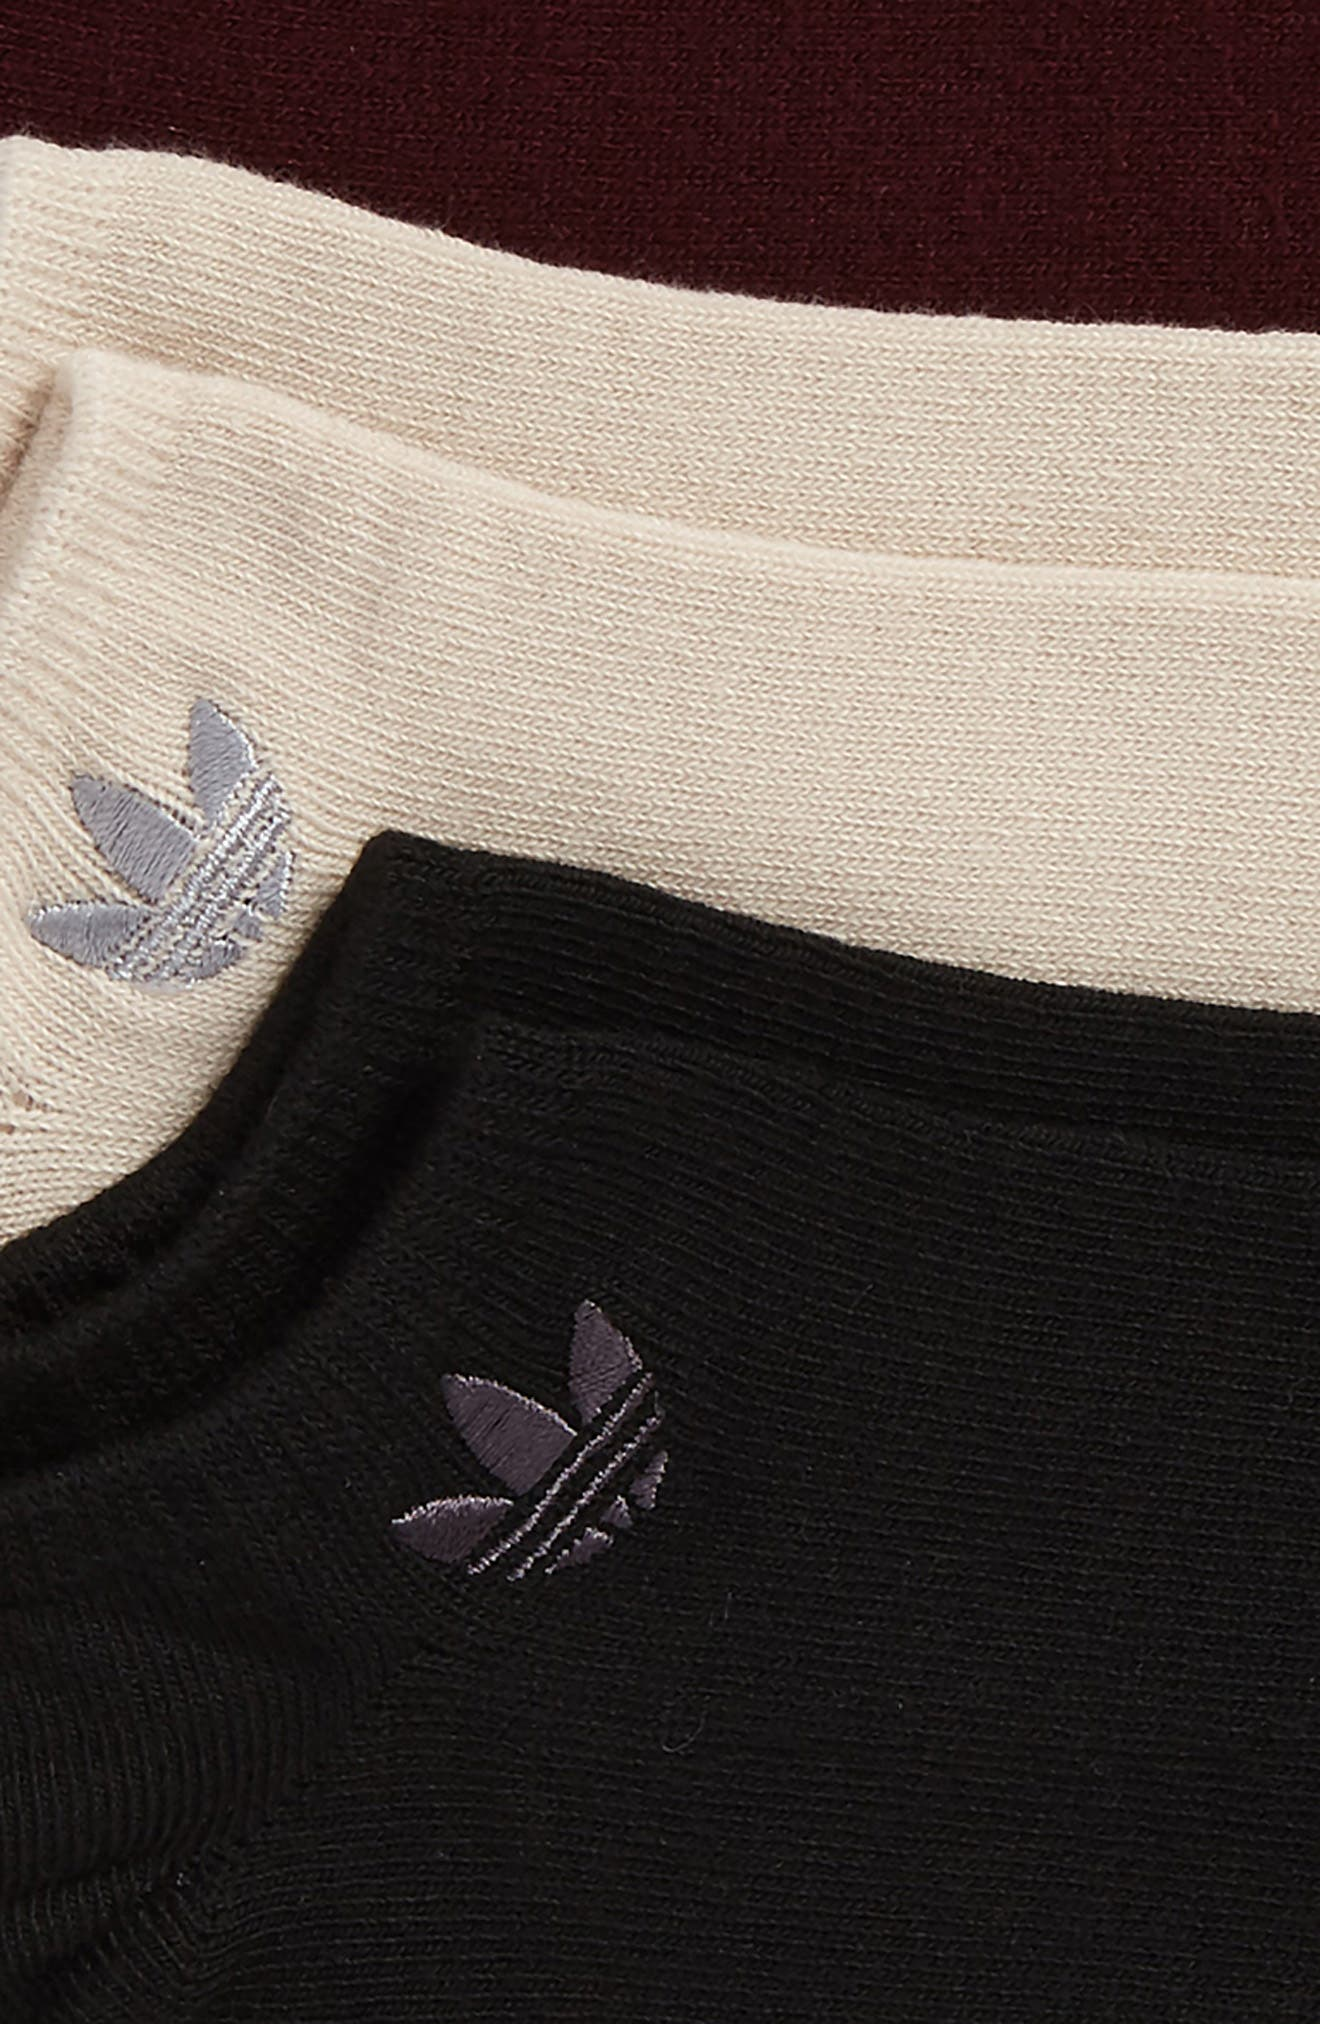 3-Pack No-Show Socks,                             Alternate thumbnail 2, color,                             Black/ Brown/ Maroon